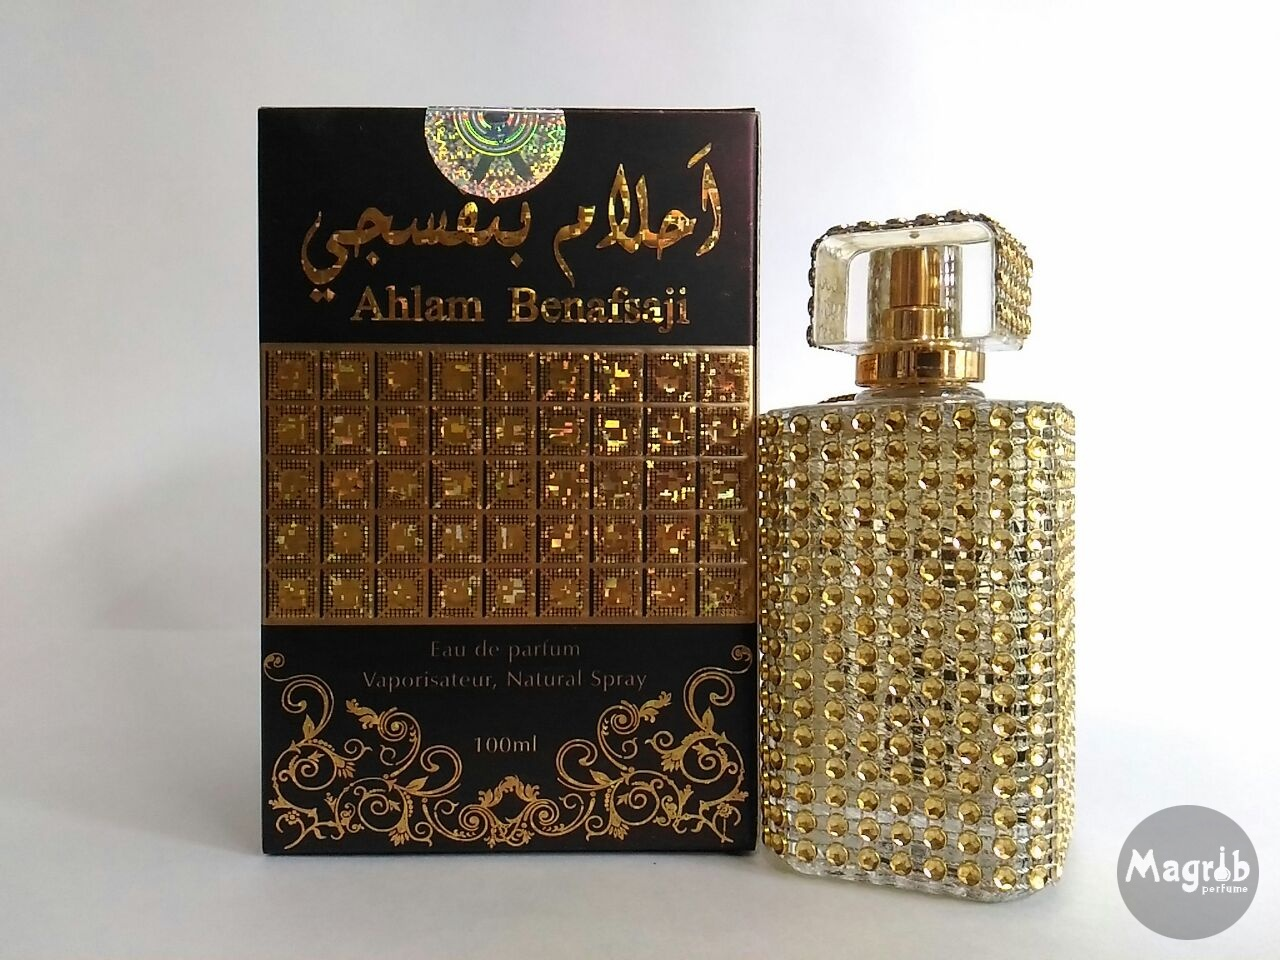 Al Khayam Zafron Ahlam Benafsaji 100ml - унисекс, парфюмерная вода